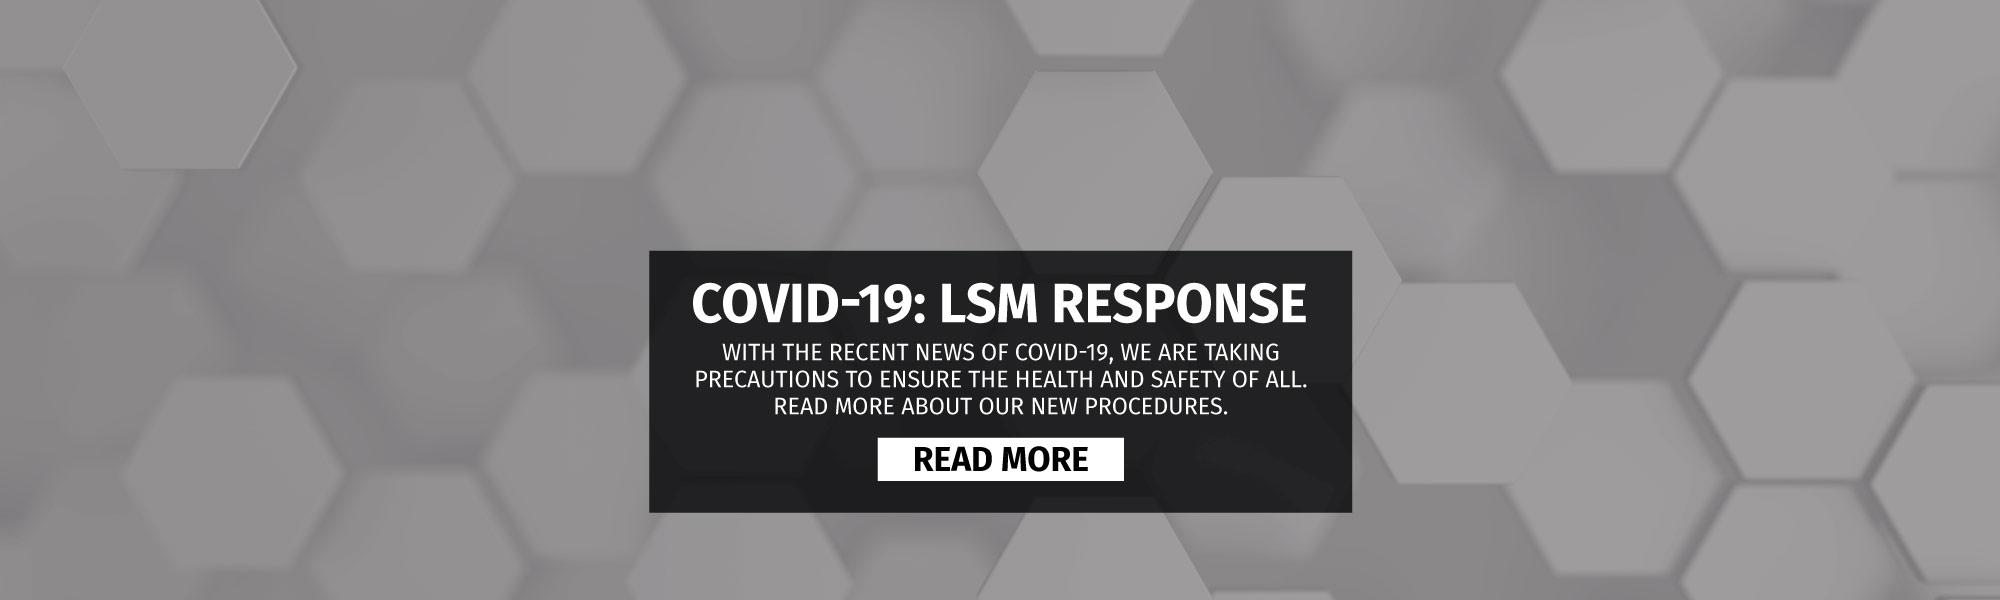 LSM Covid-19 Response